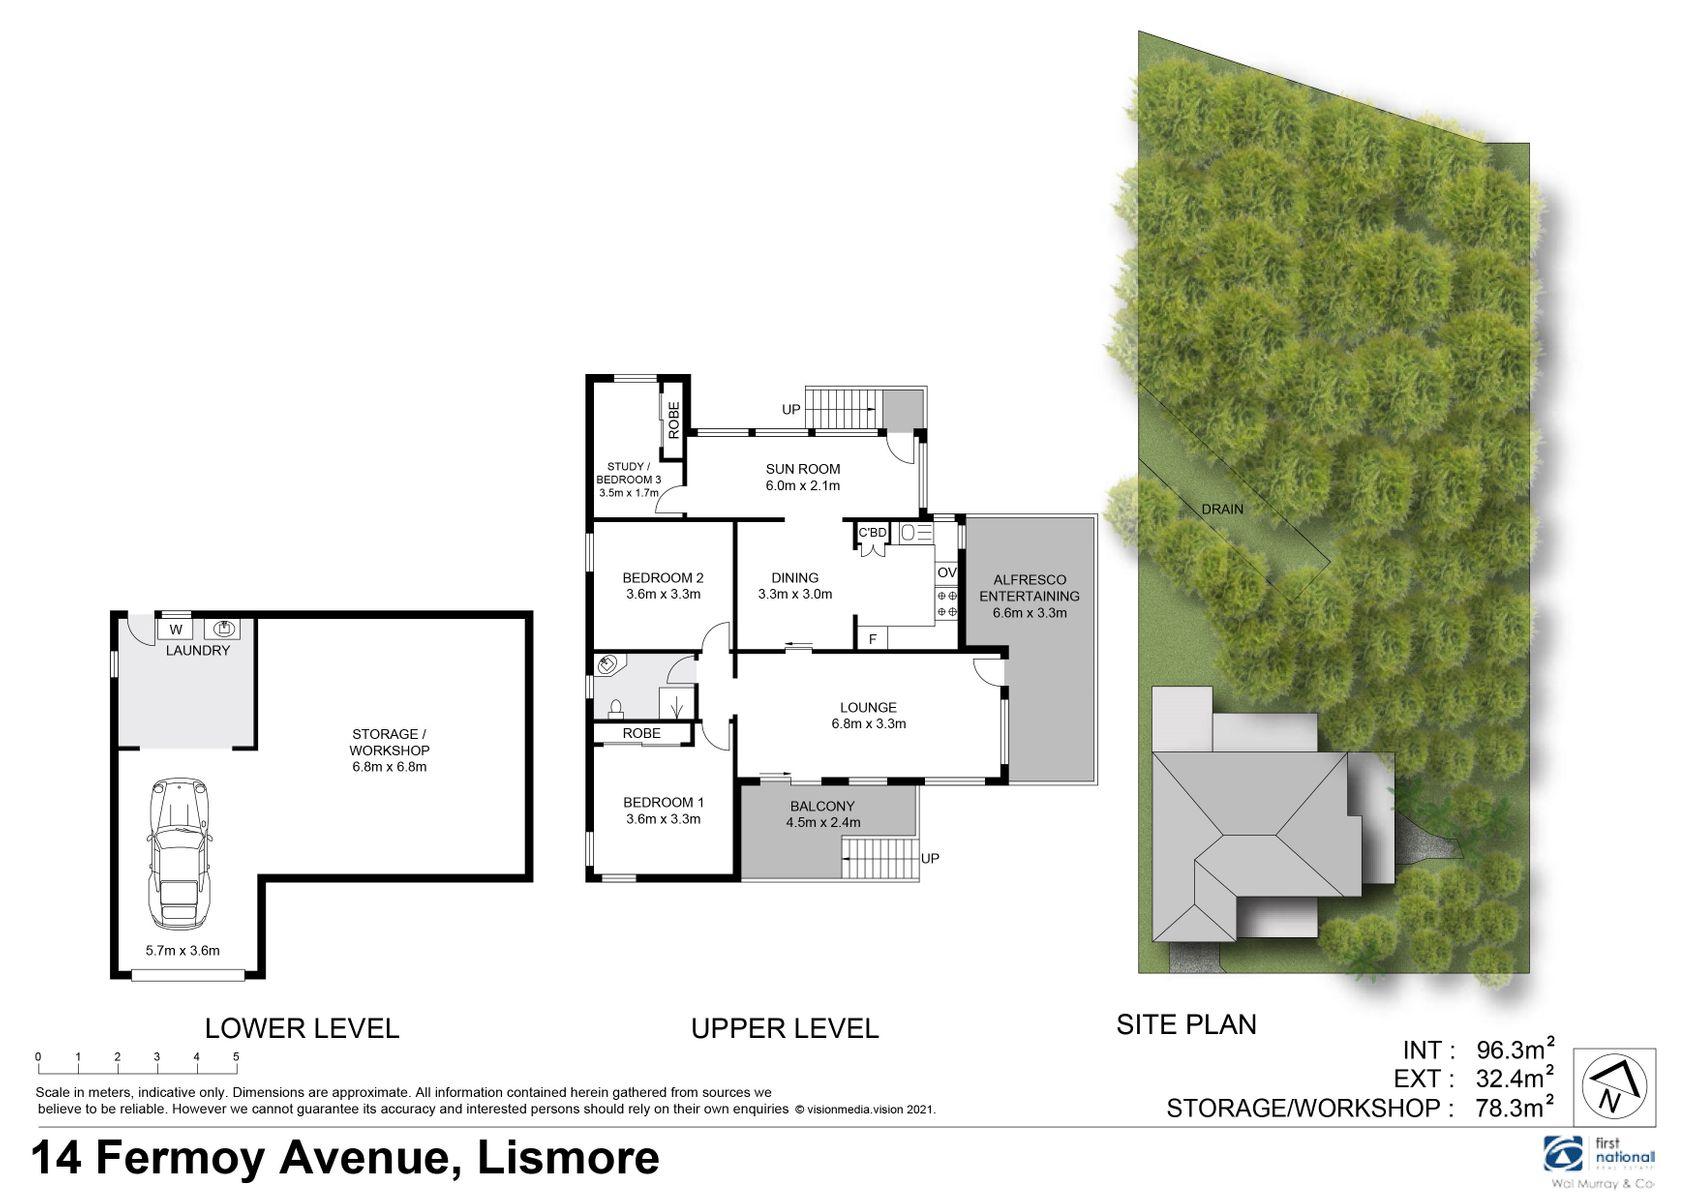 14 Fermoy Avenue, Lismore, NSW 2480